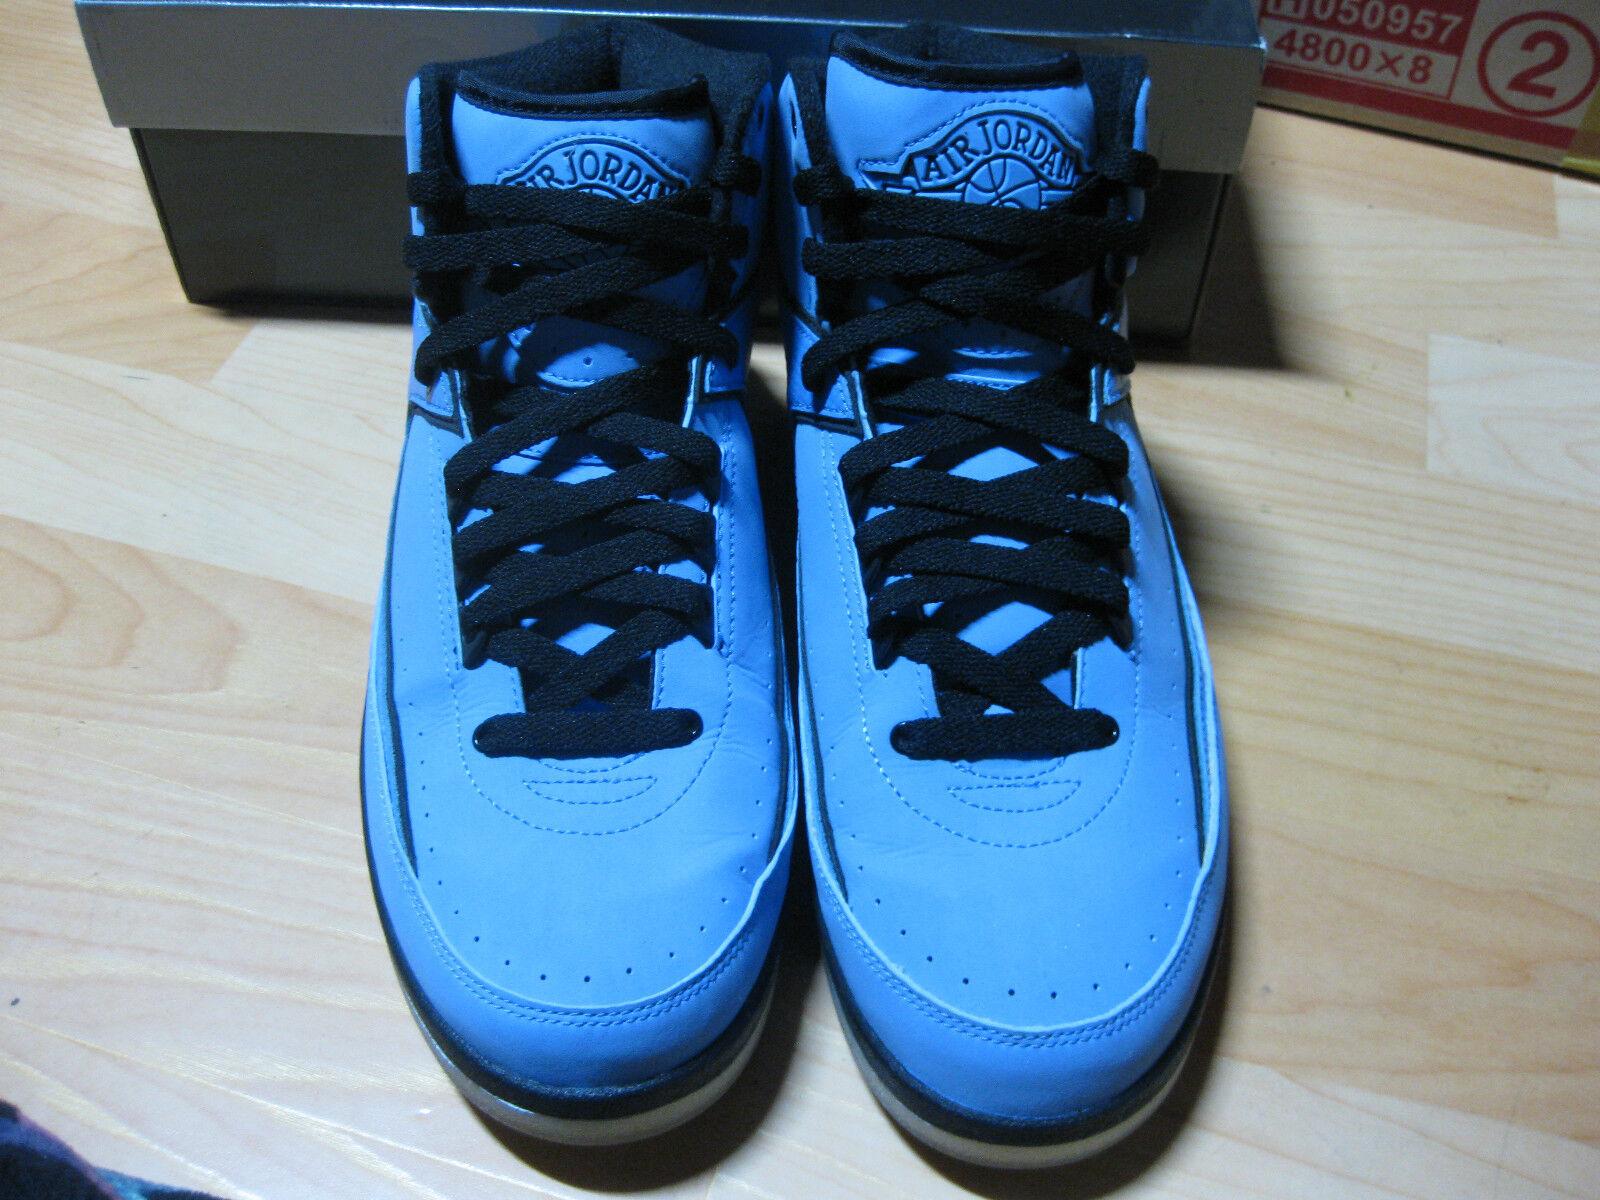 Nike  AIR JORDAN 2 RETRO  Candy Pack University Blue Sz 10